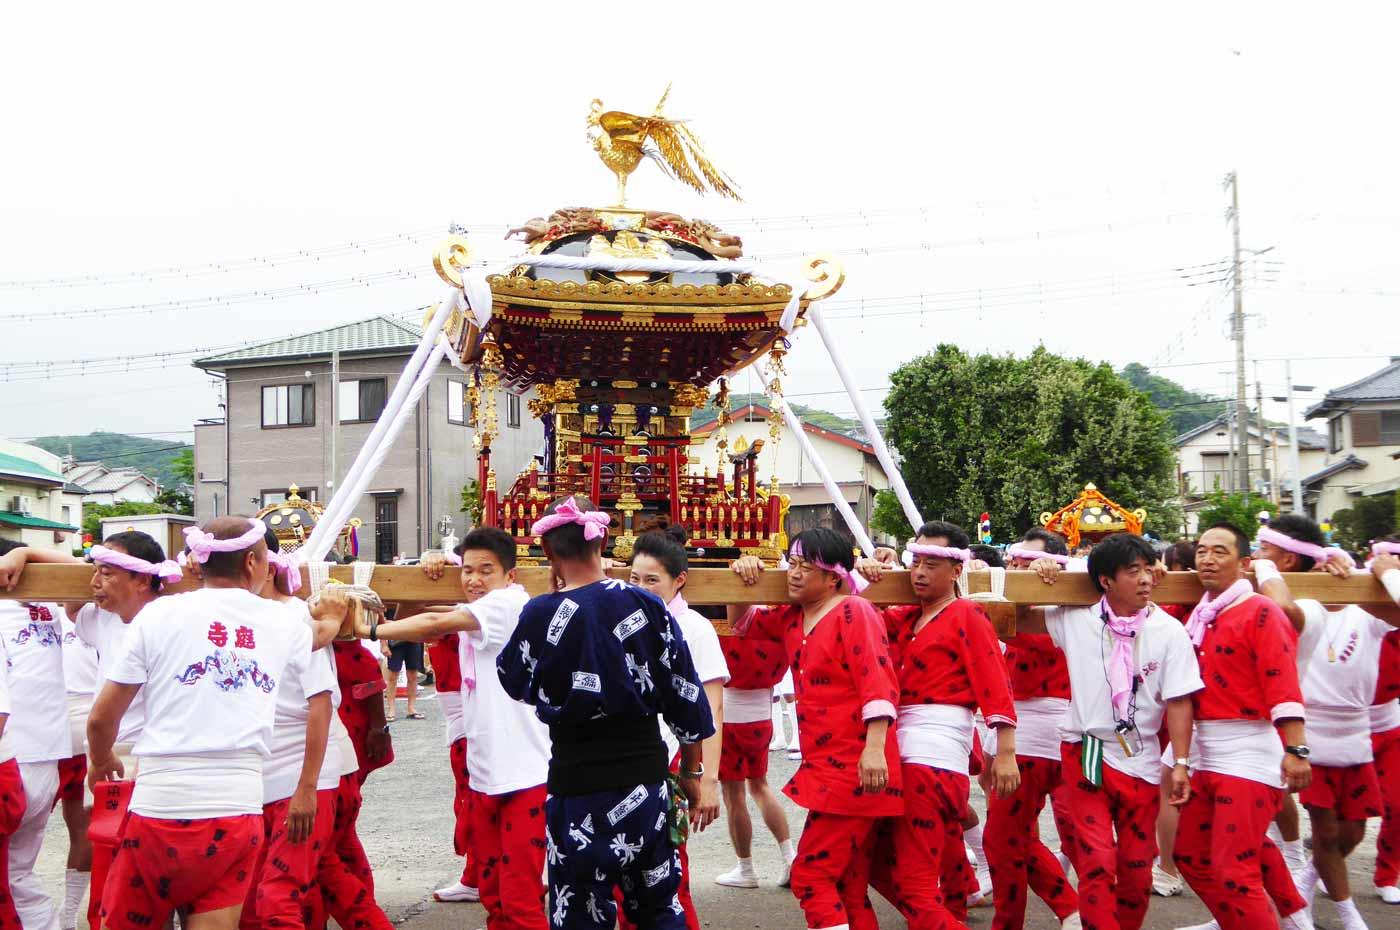 寺庭地区 八幡神社の神輿